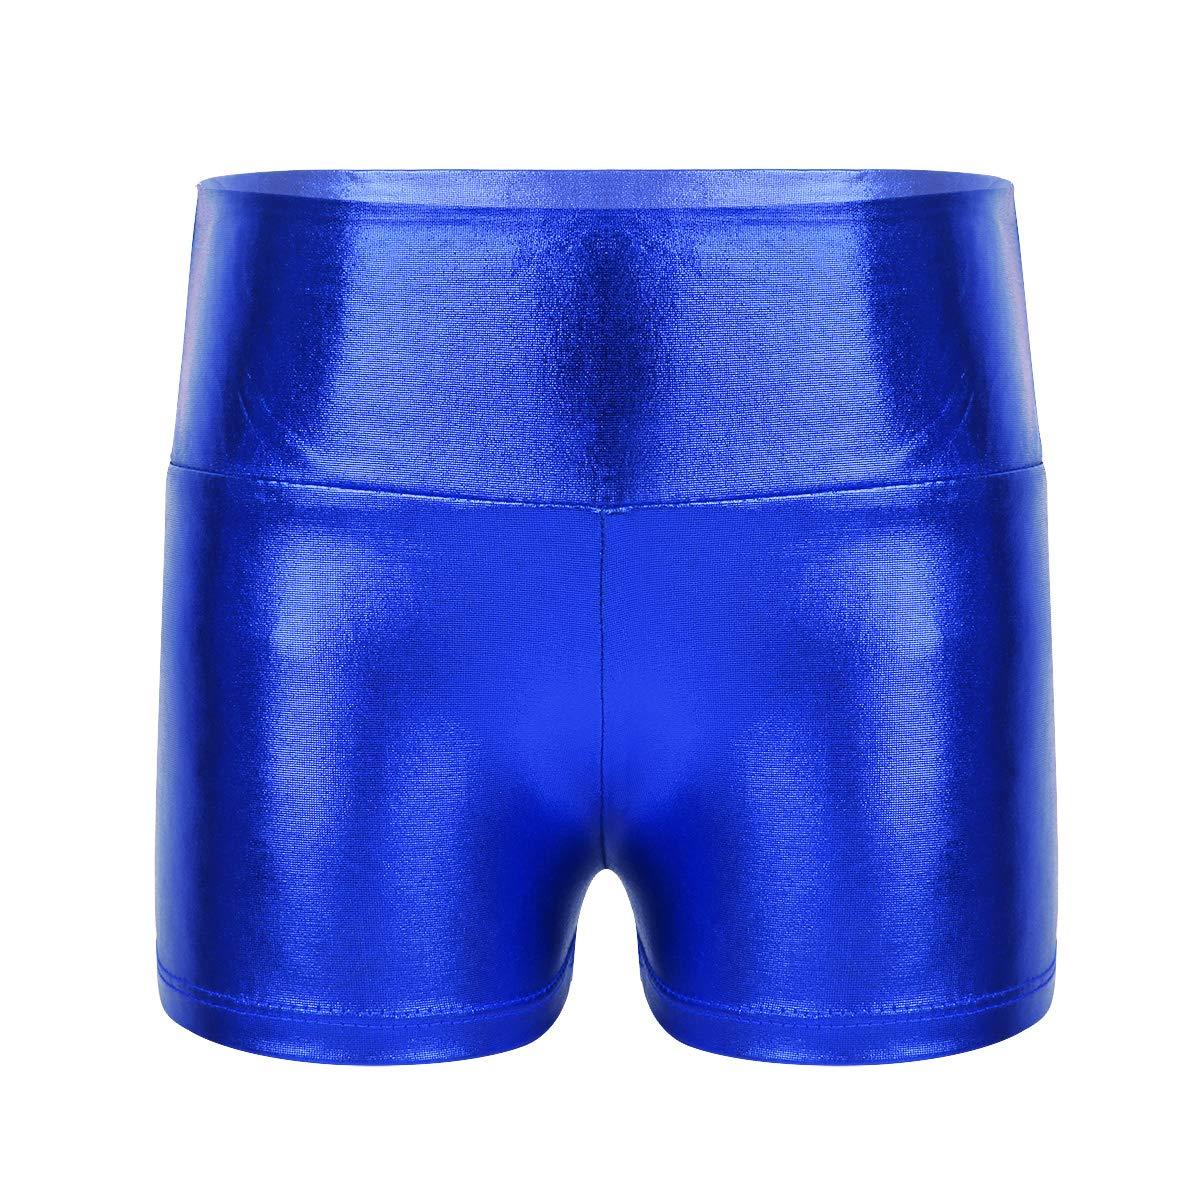 Agoky Kids Girls Metallic Shiny Gymnastics Workout Yoga Dance Sports Shorts Bottoms Blue 6